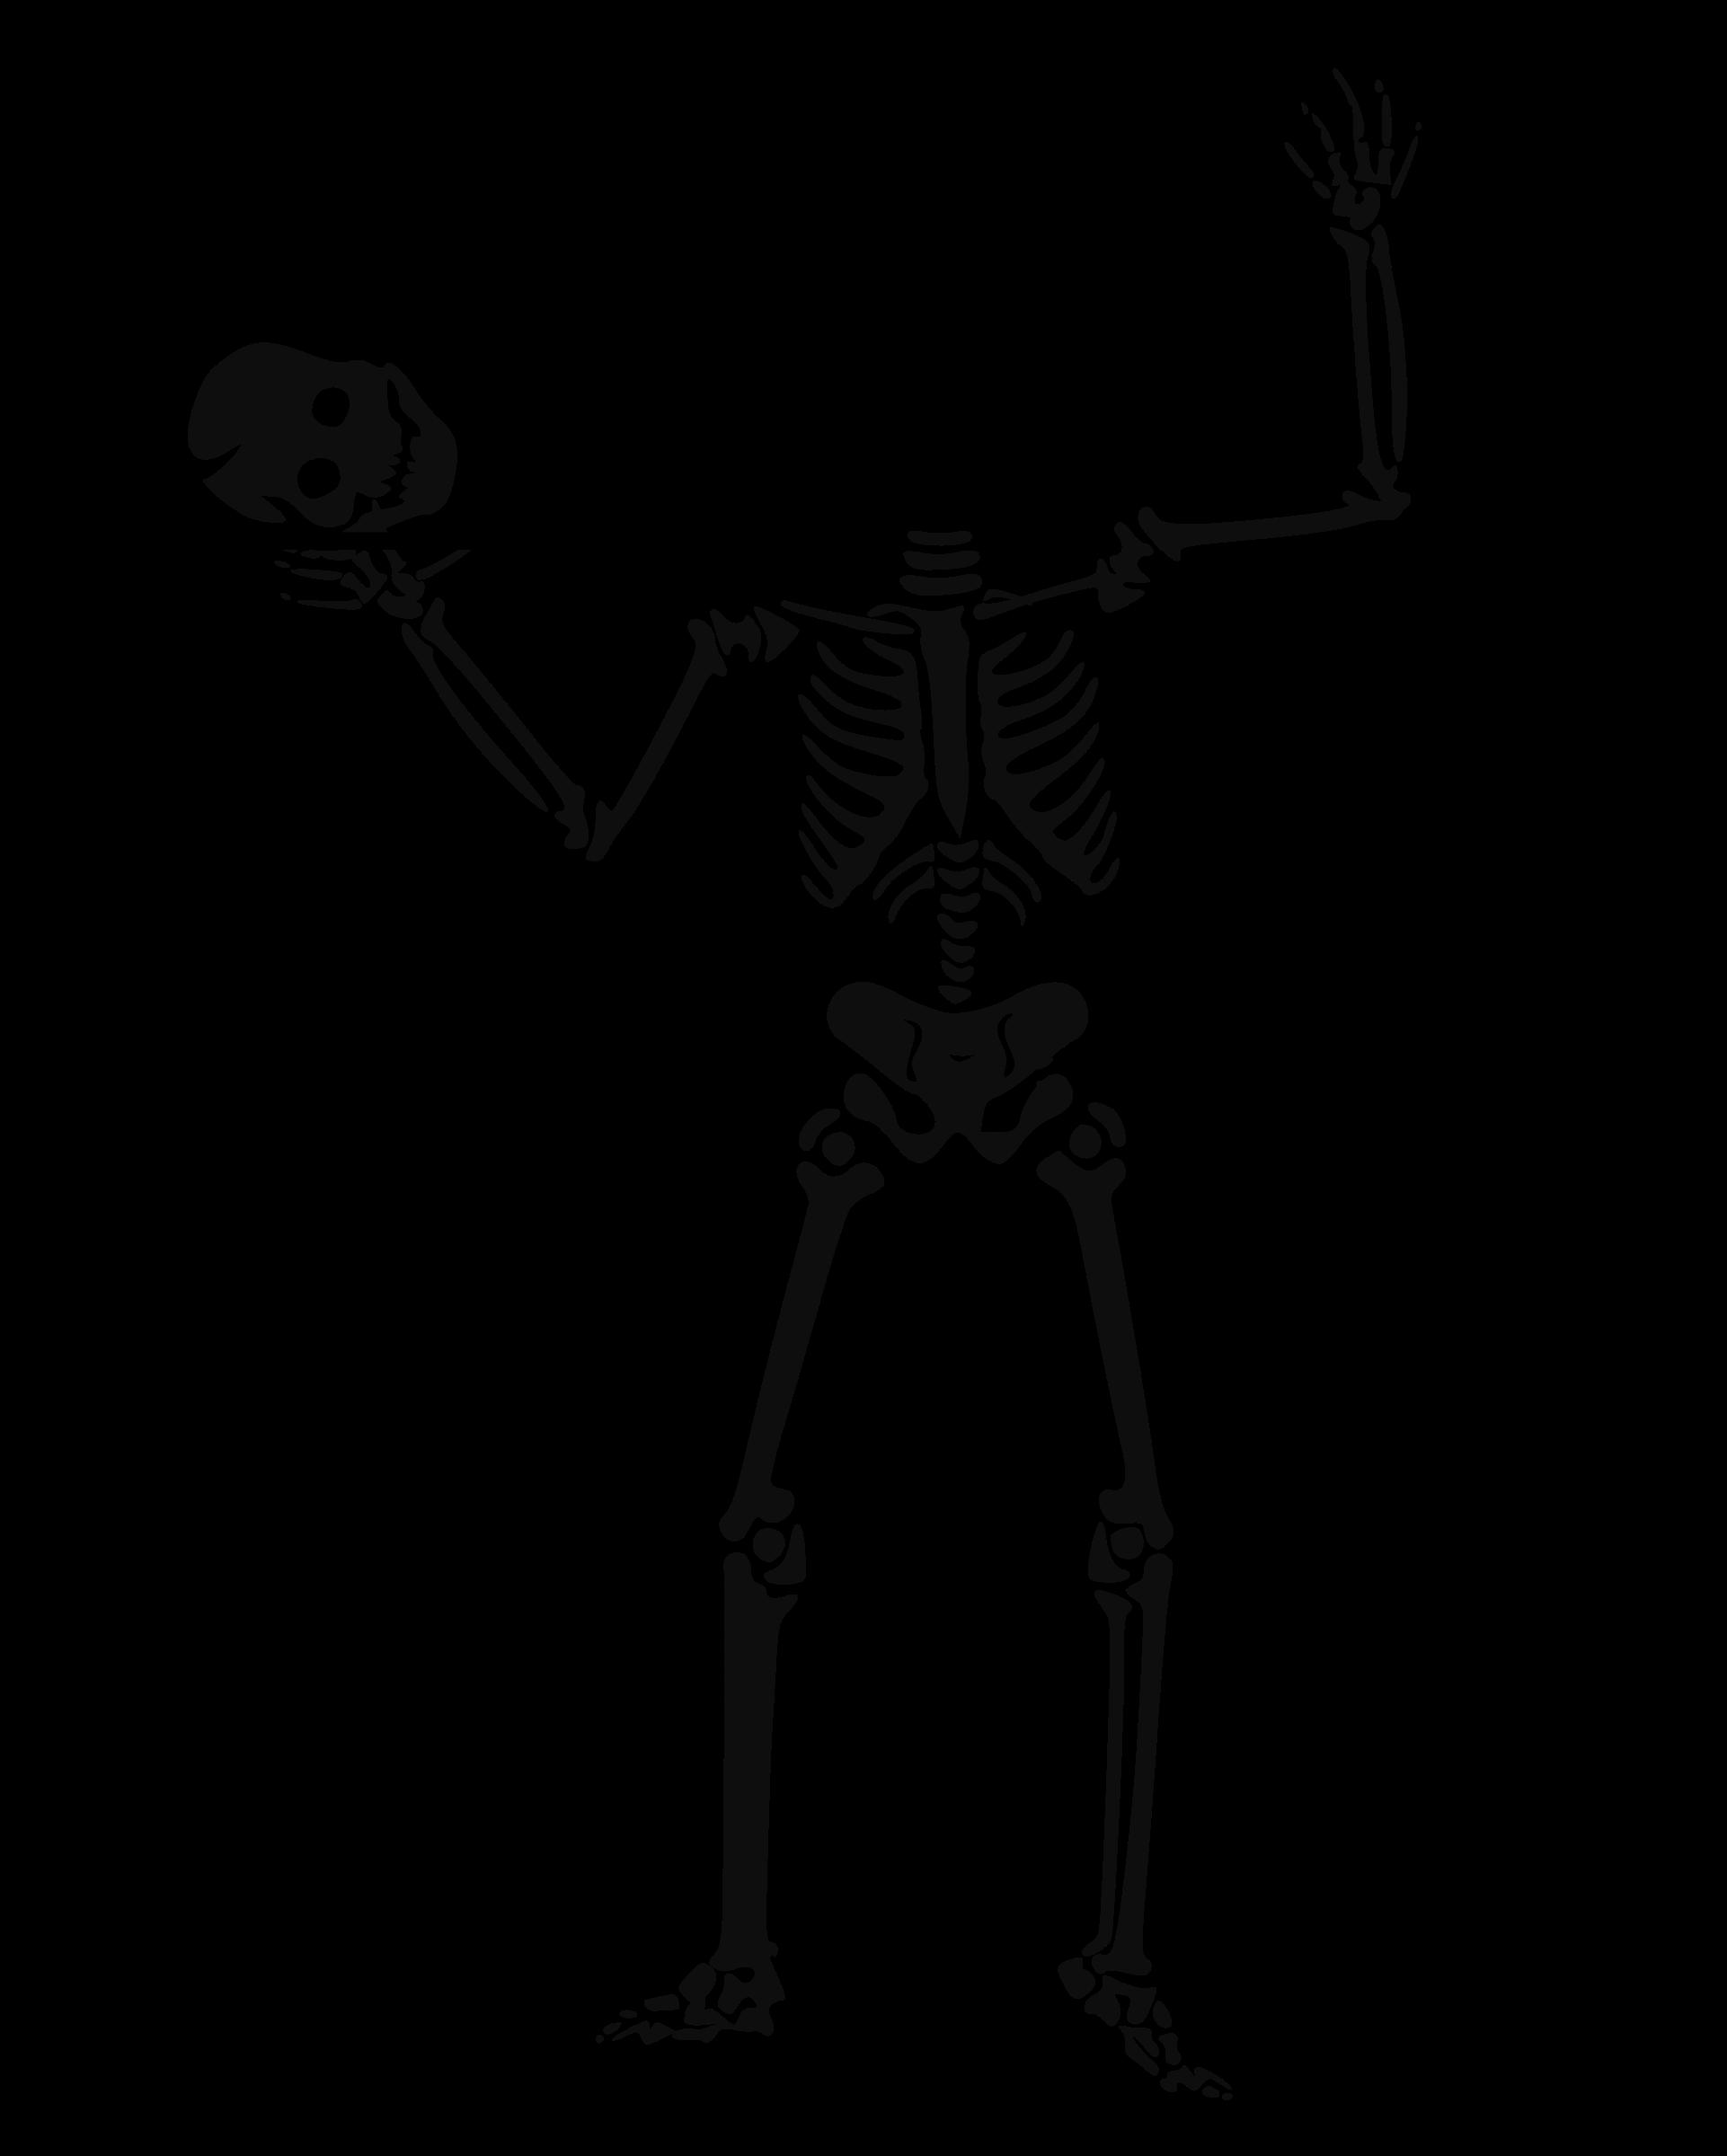 Halloween skeleton clipart black and white svg free Clipart - halloween 0017 svg free